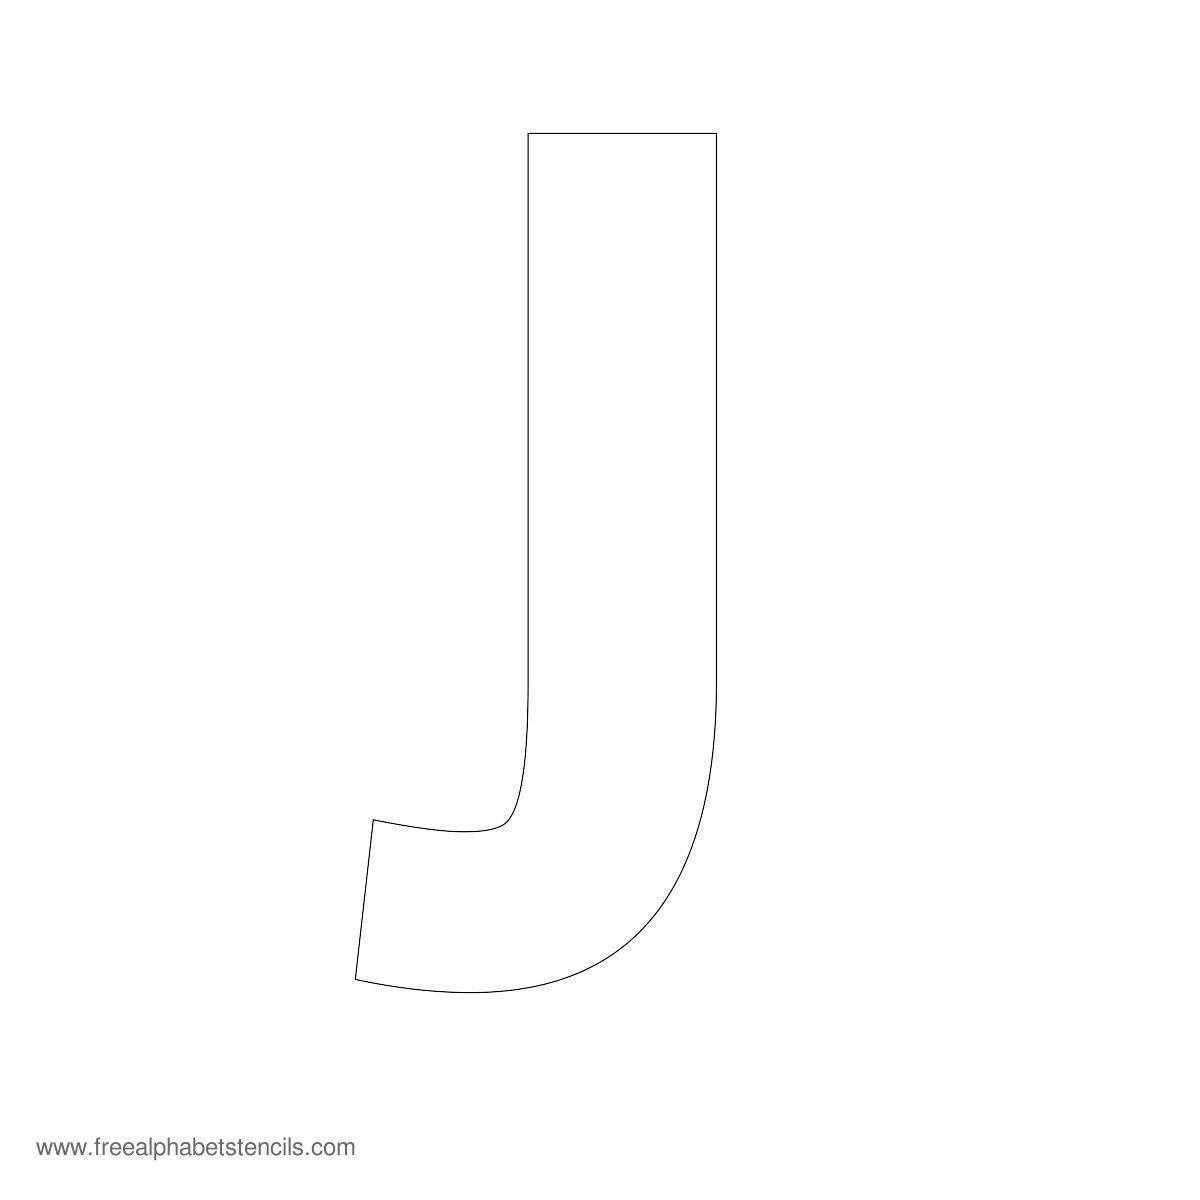 Large Alphabet Stencils | Freealphabetstencils - Large Printable Fonts Free